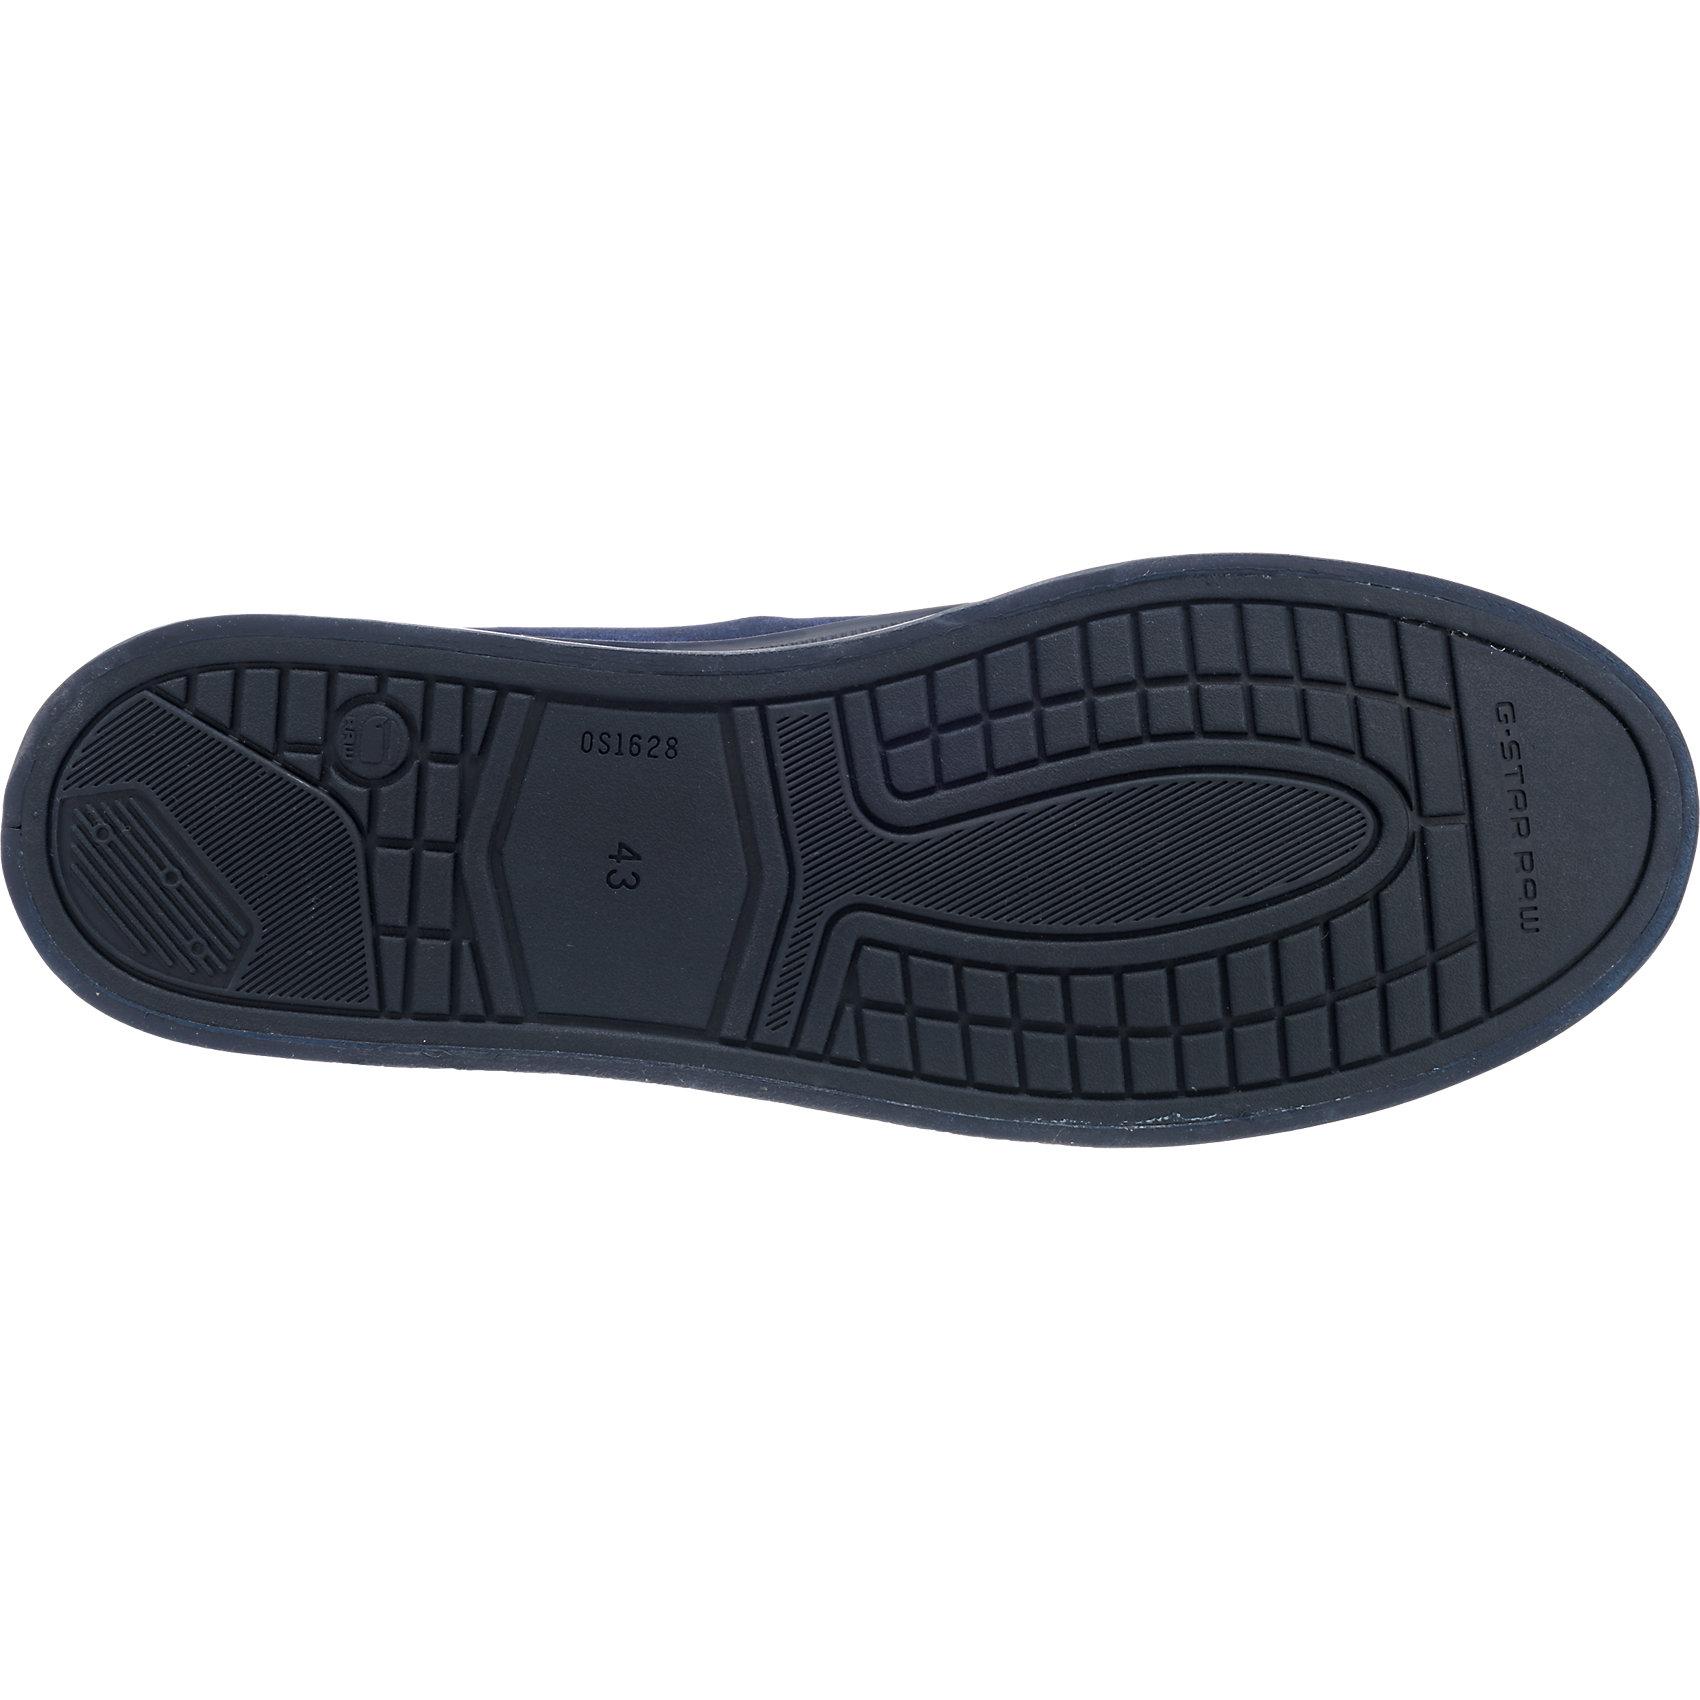 Neu G-STAR Bronson Sneakers grau blau grau Sneakers 5771520 21e9fc